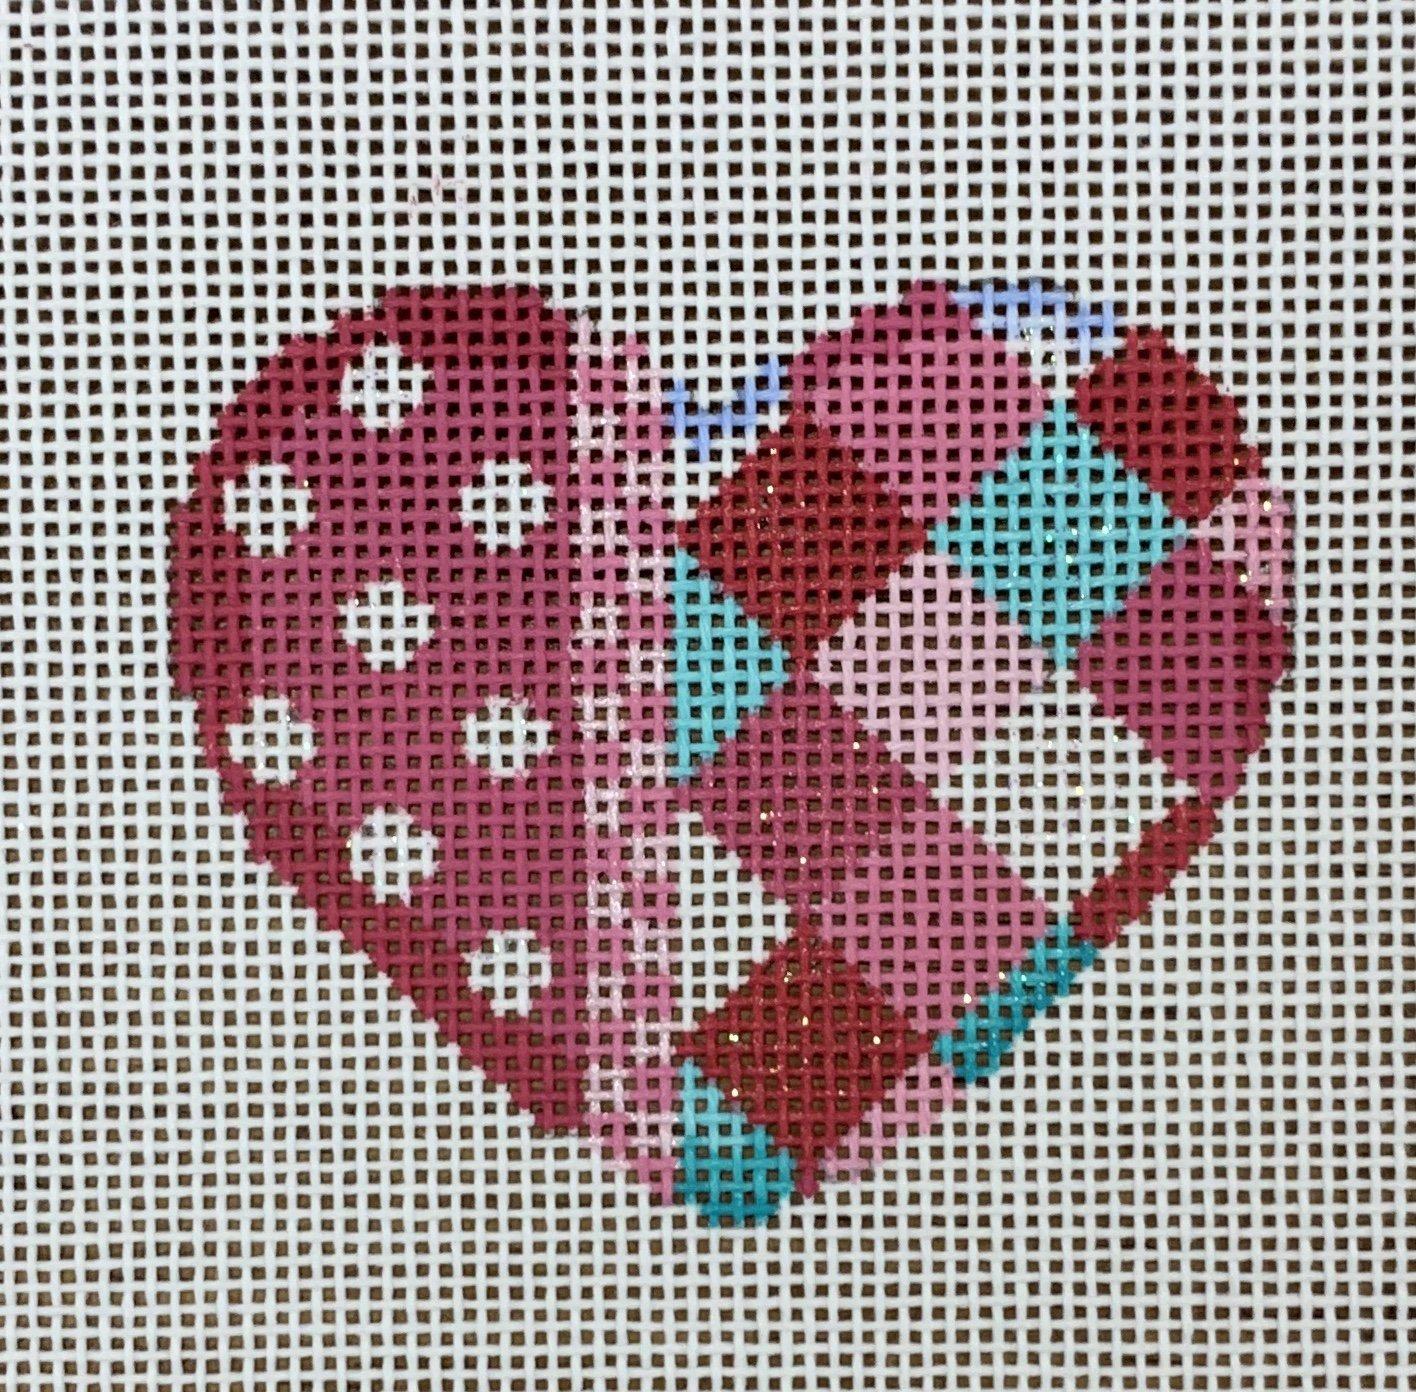 ATTSHE670 Coin Dot/Harlequin Mini Heart  2.75x2.5  18